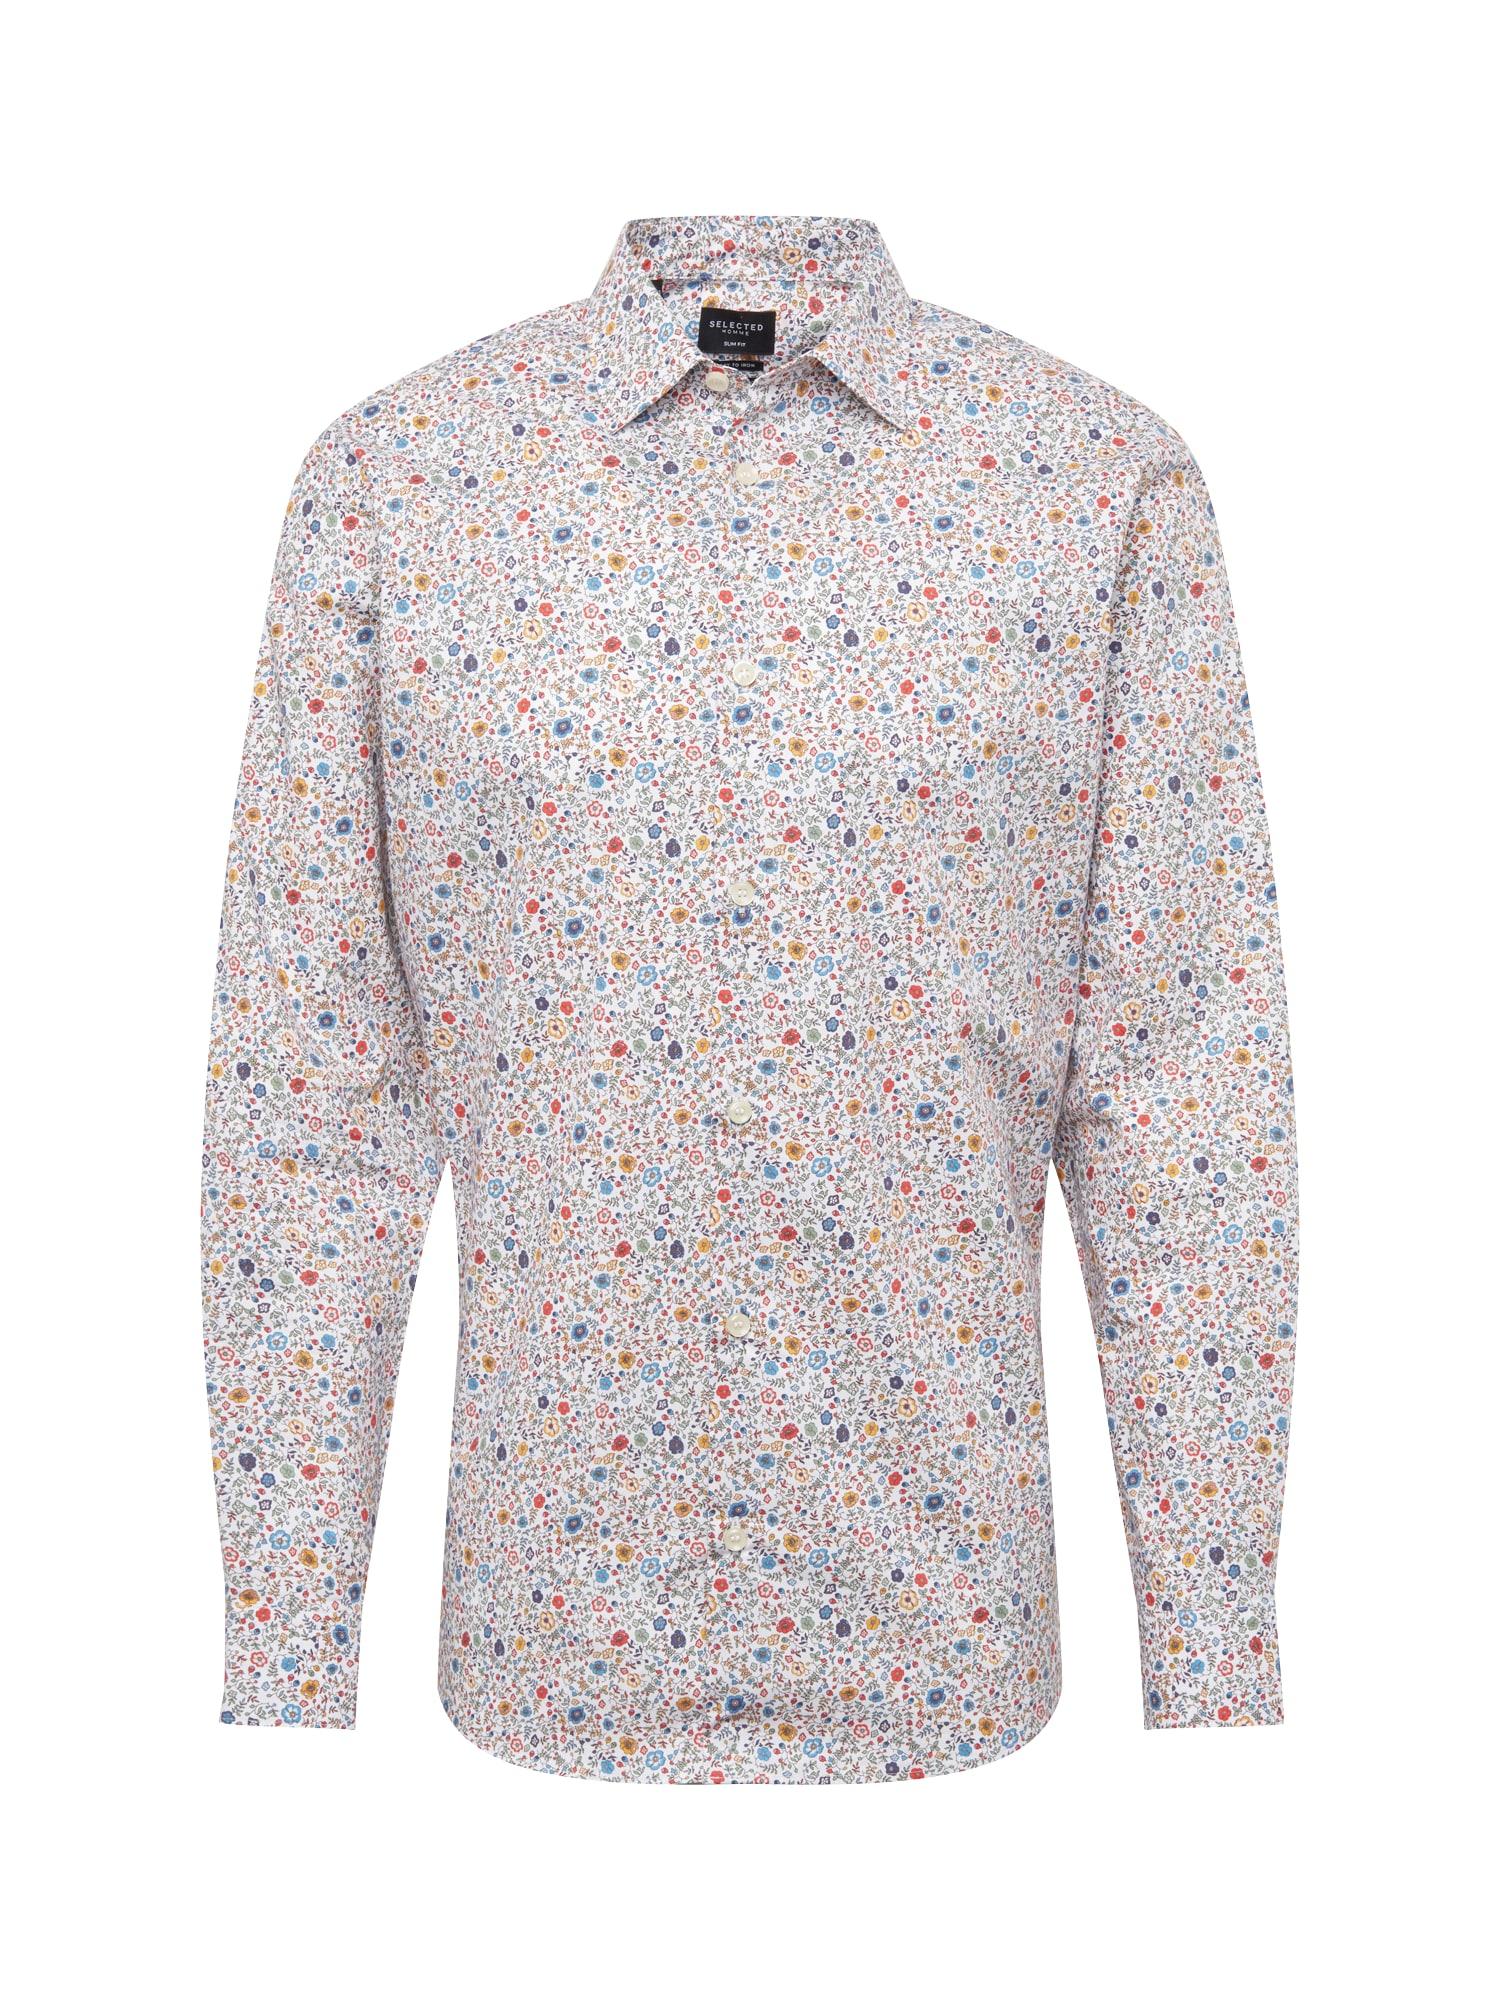 Košile SLIMPEN-GARDEN mix barev bílá SELECTED HOMME